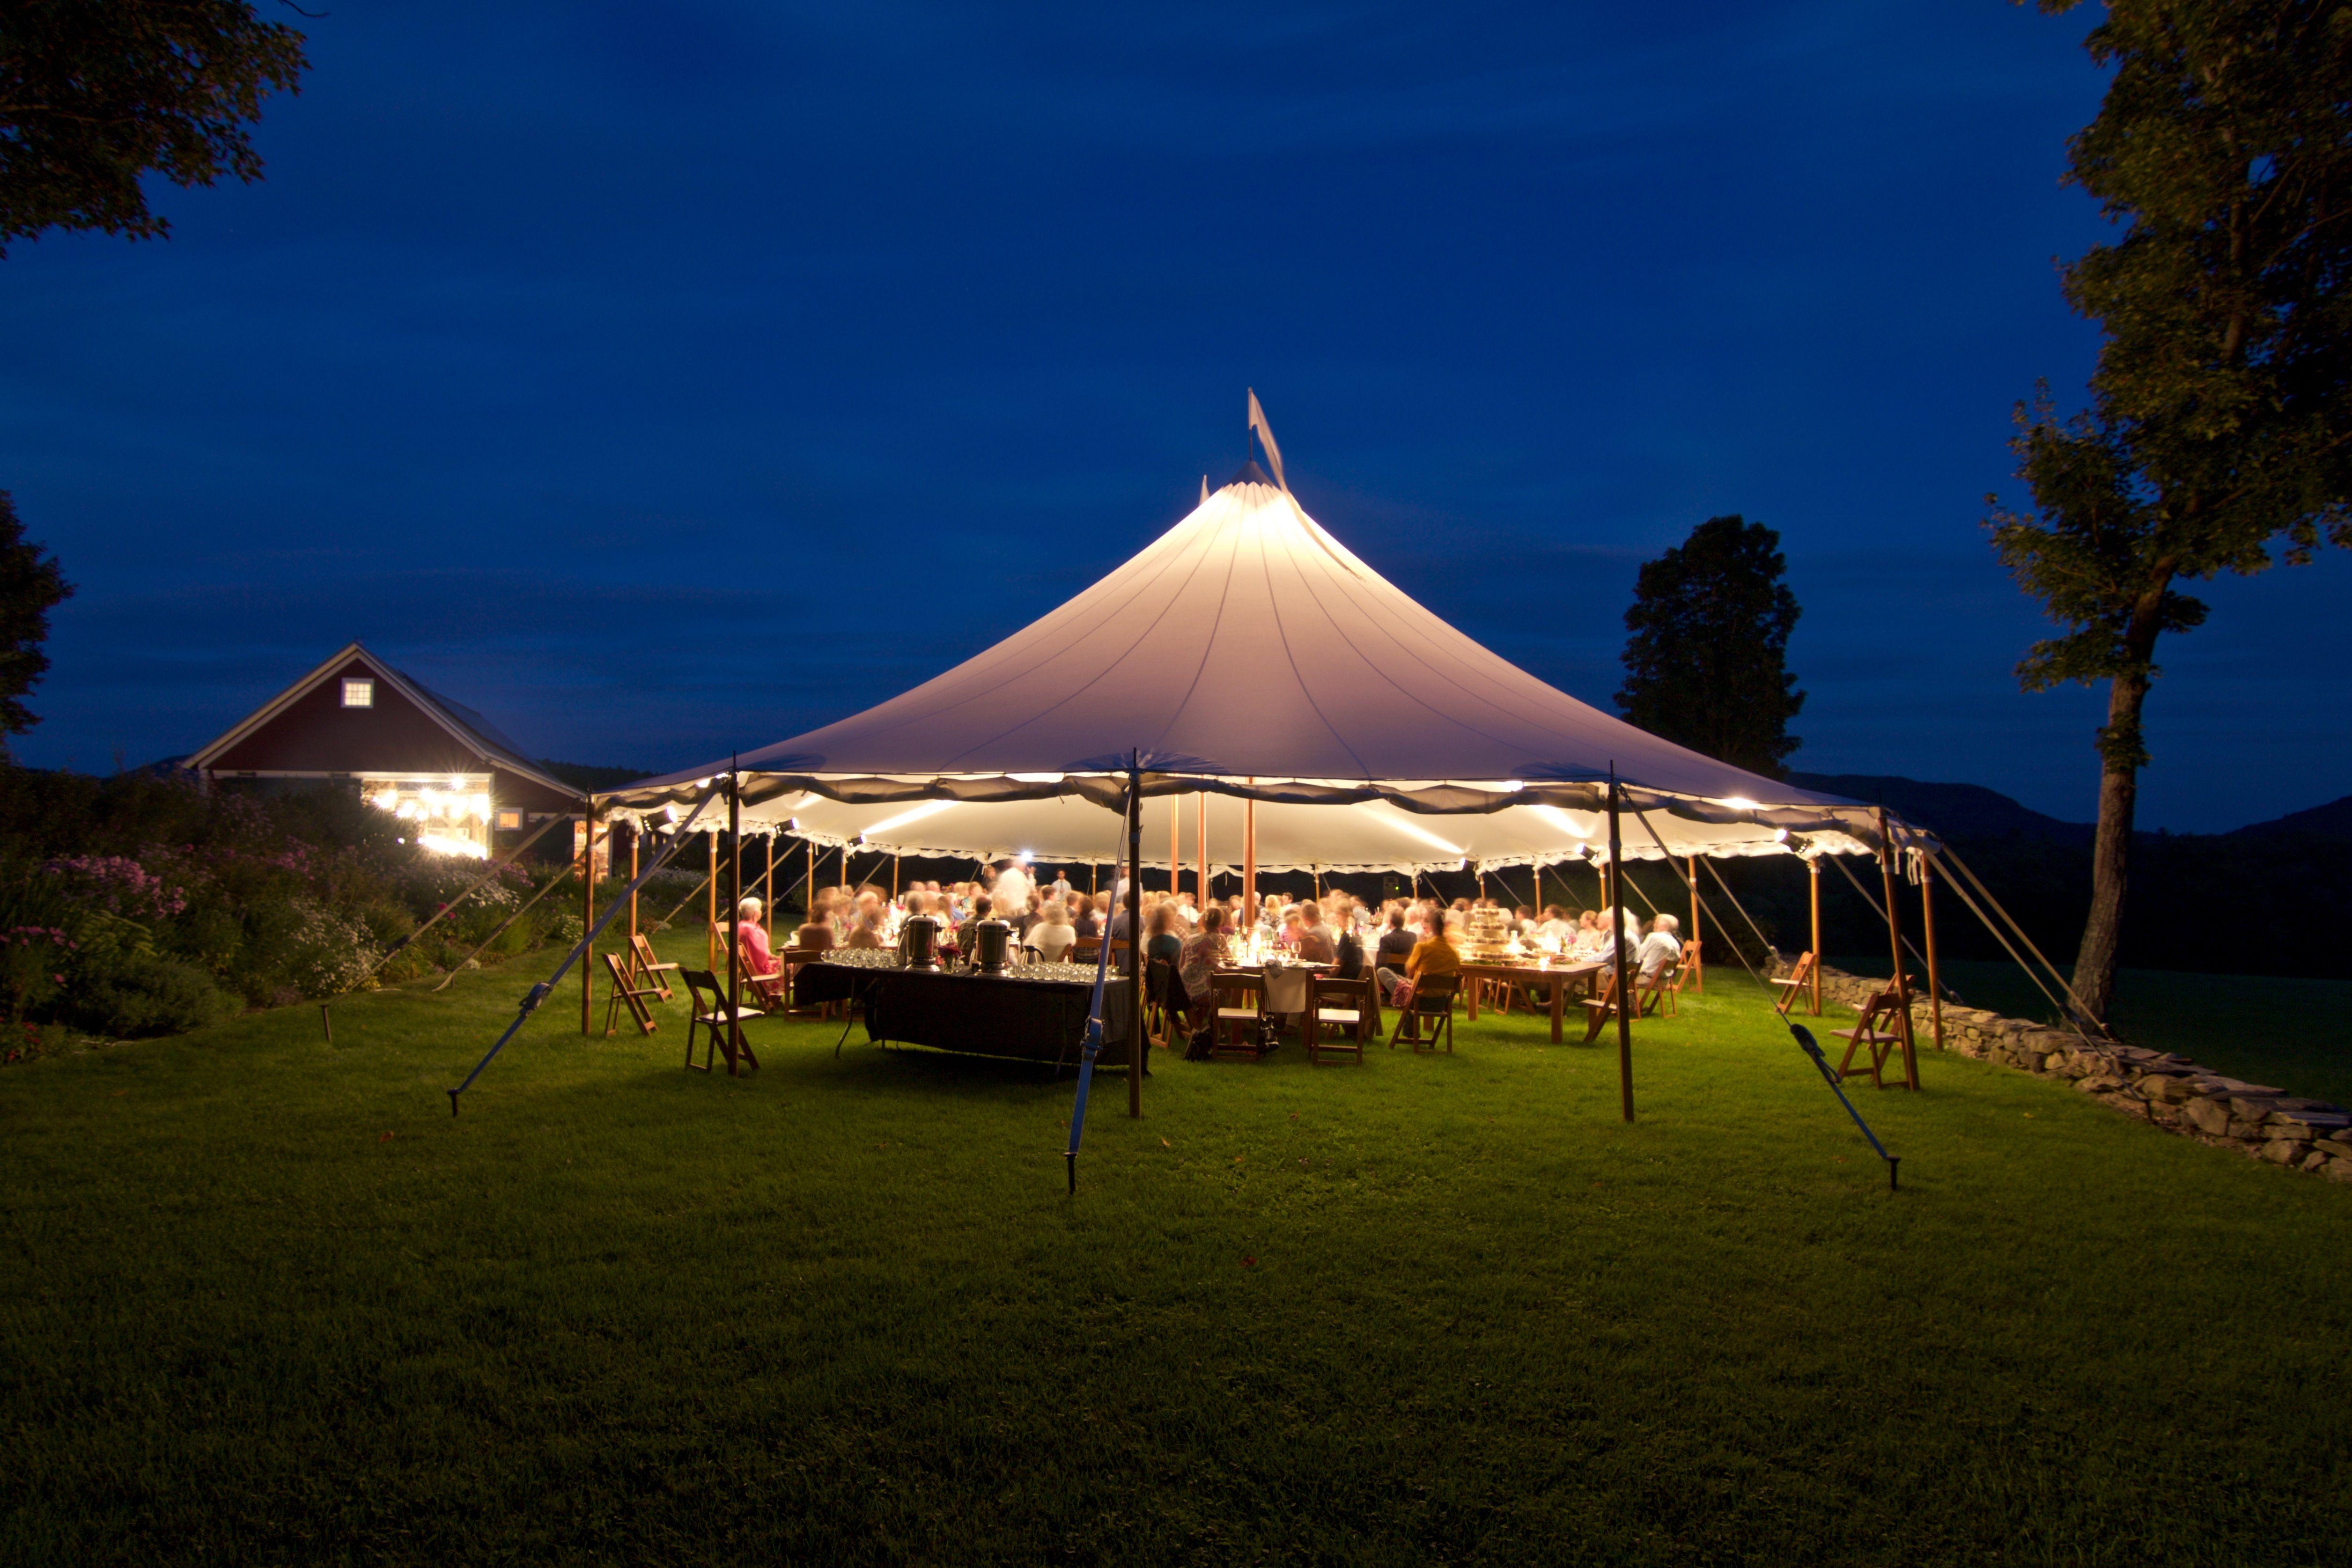 Sailcloth Tent At Night Tent Patio Umbrella Outdoor